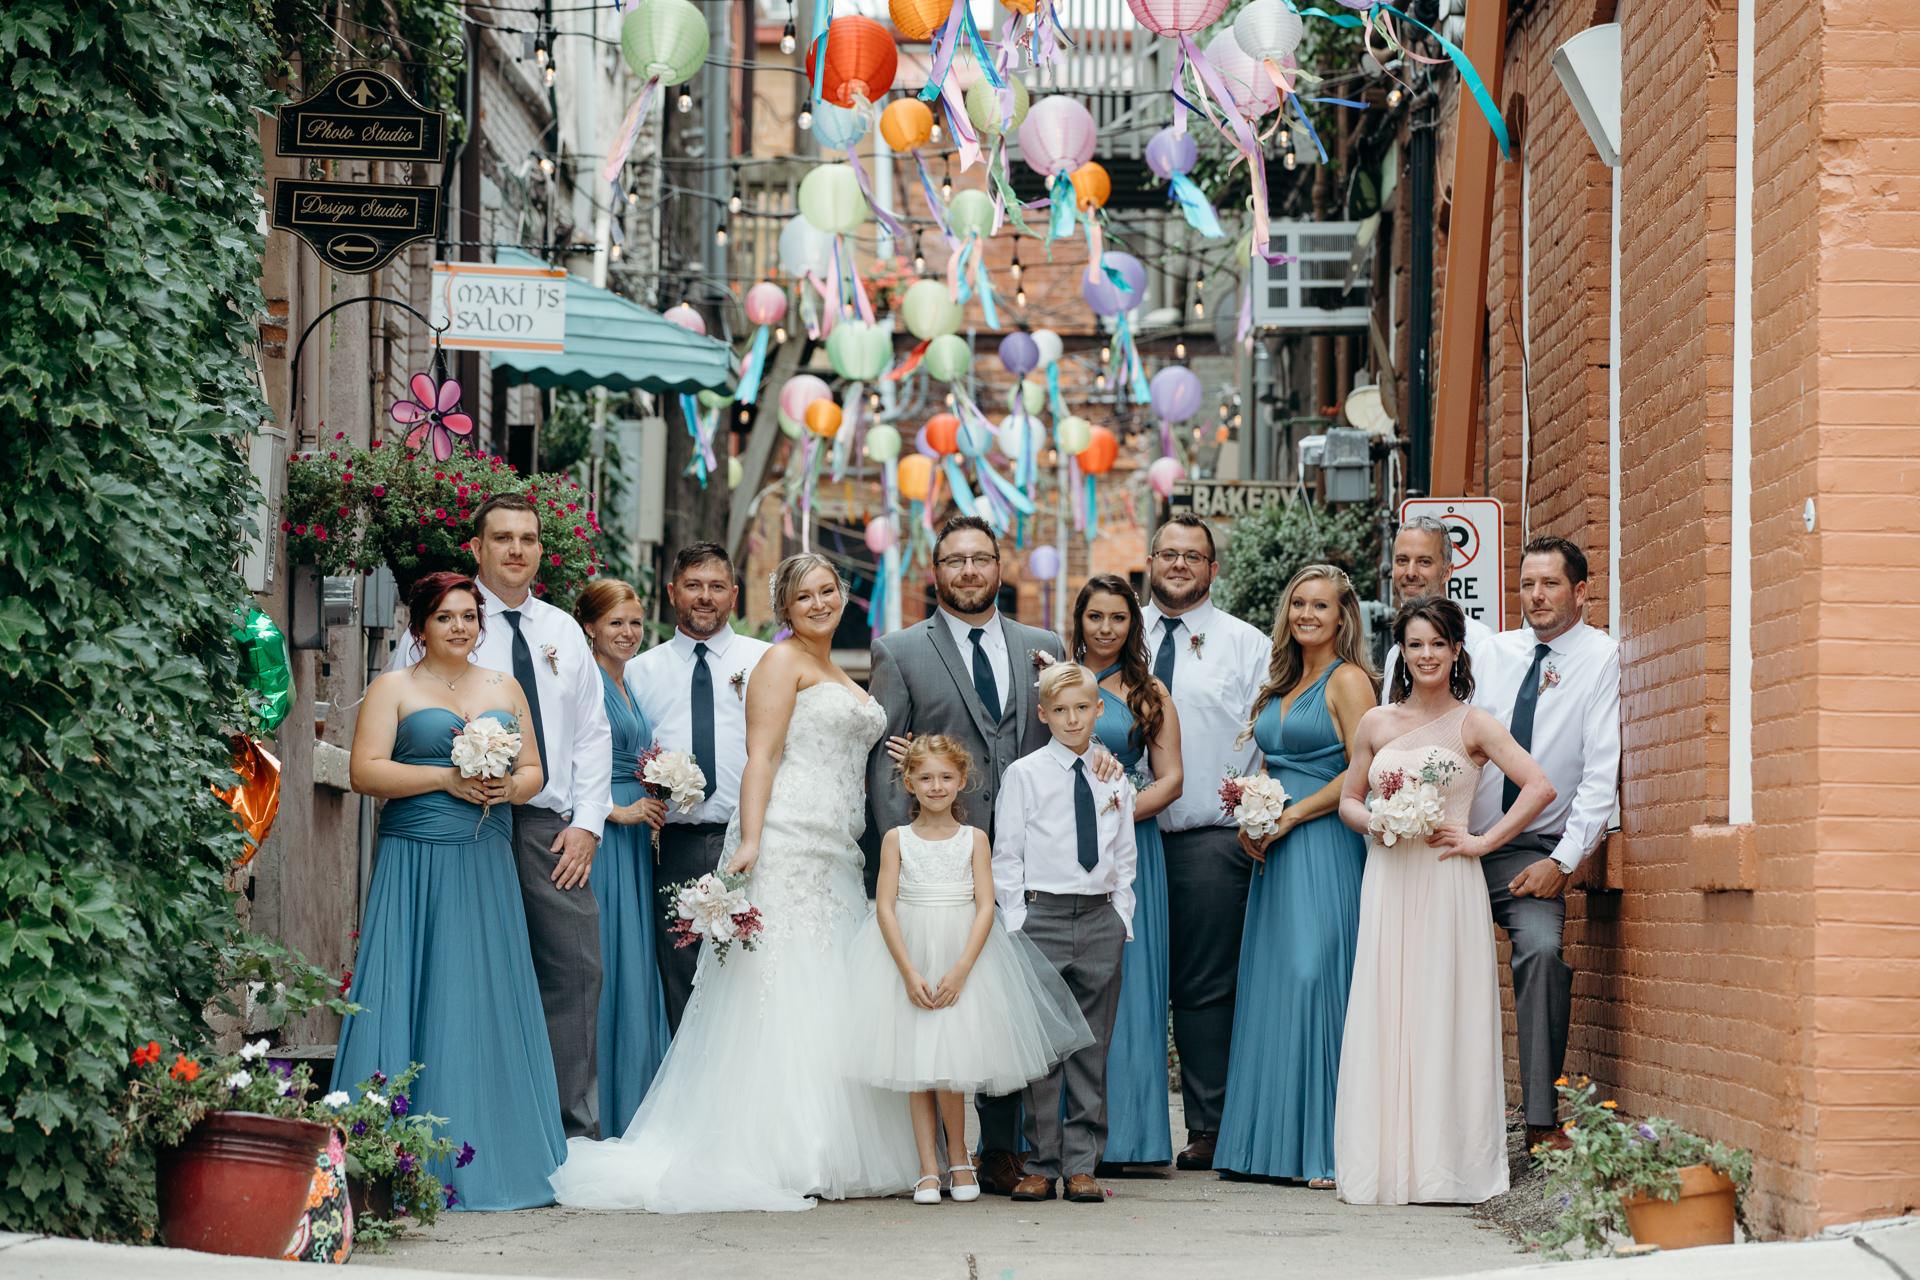 Grant Beachy wedding photographer elkhart goshen south bend, warsaw chicago-2230.jpg